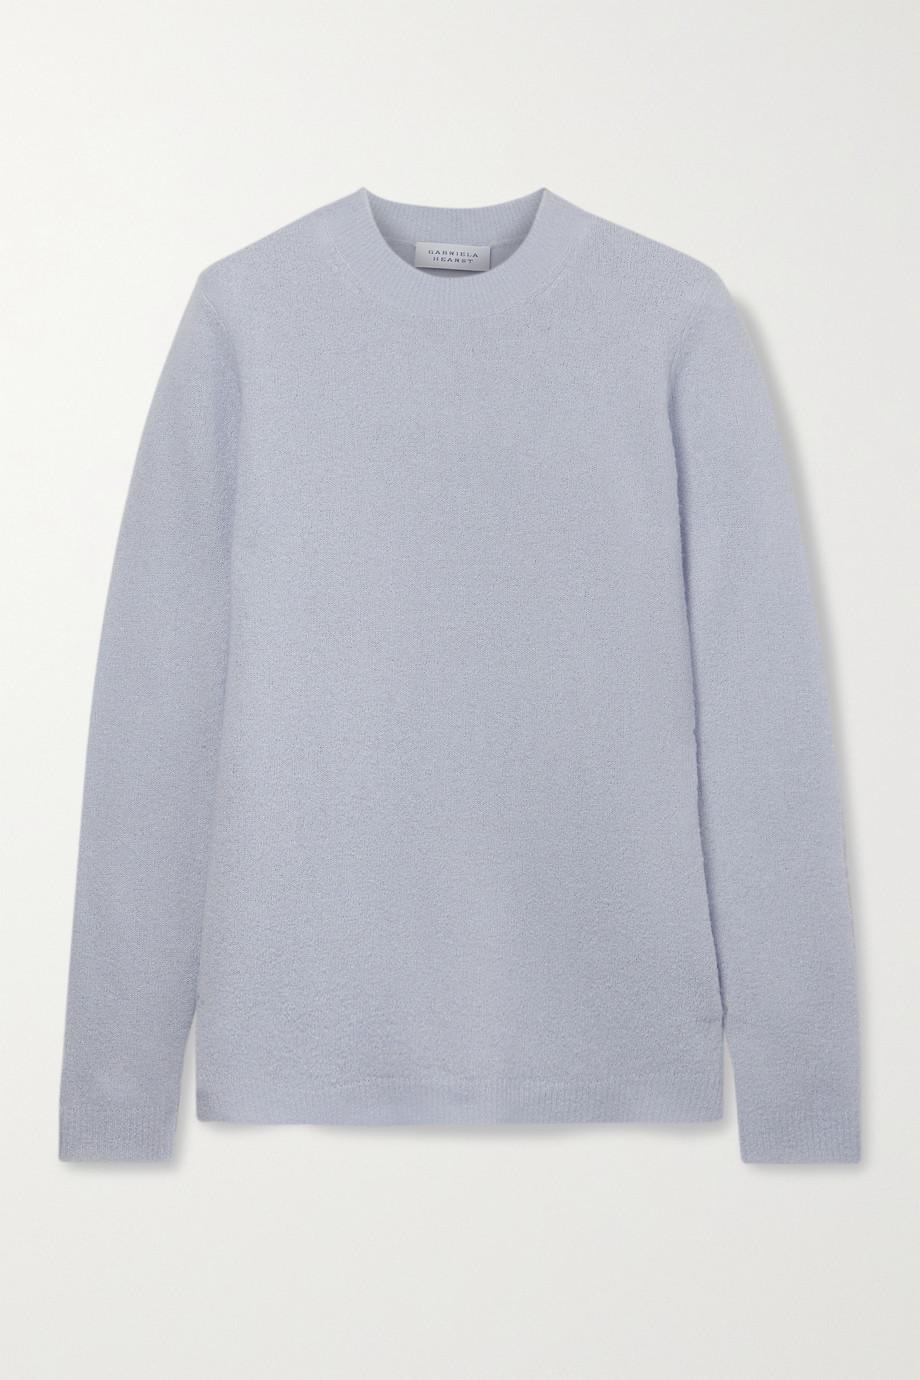 Gabriela Hearst Harius cashmere and silk-blend bouclé sweater